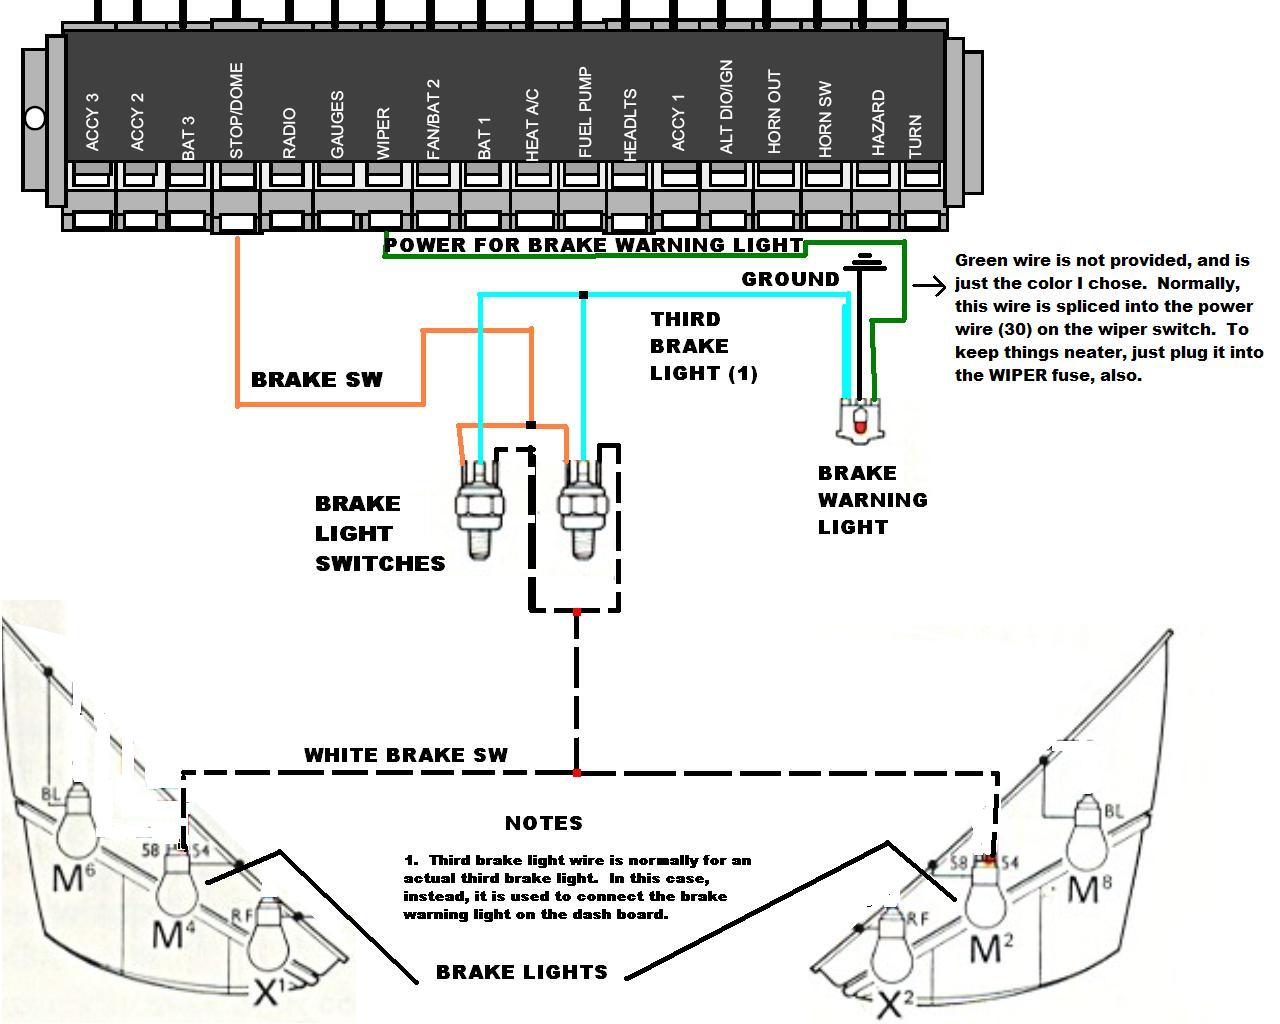 home c2 bb astra engine diagram , electrical system block diagram ,  duramax fuel filter water sensor , cornering light wiring diagram , ryder  utility